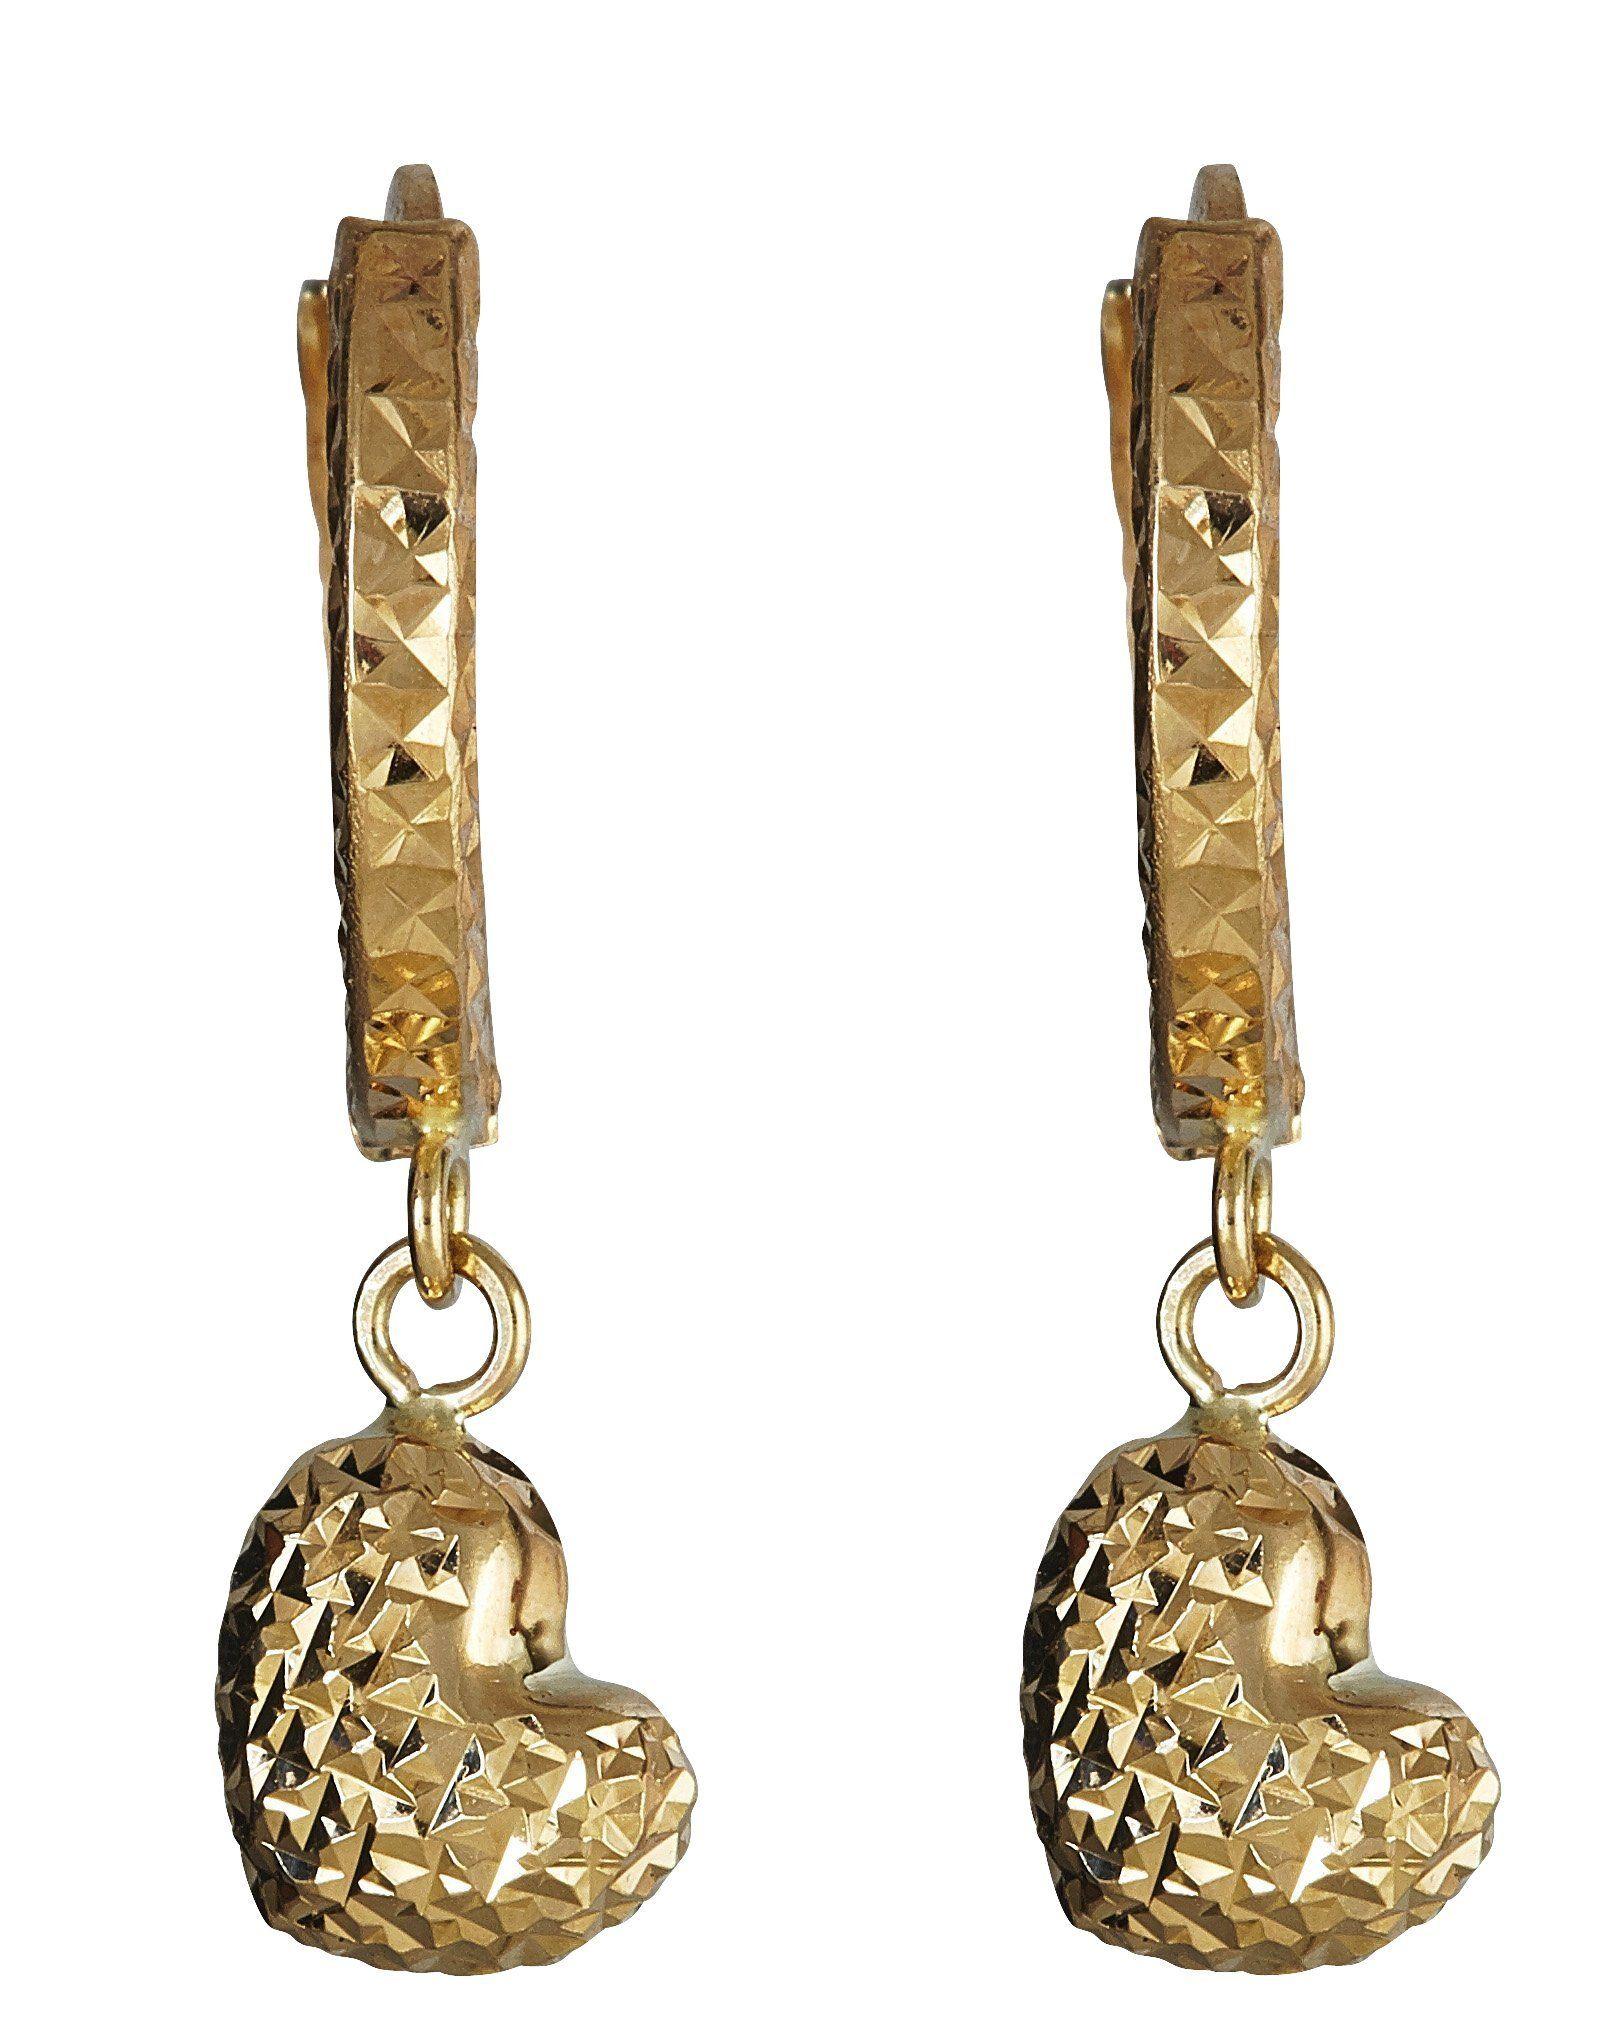 14K Yellow Gold Diamond Cut Heart Huggie Earring 14K SOLID GOLD